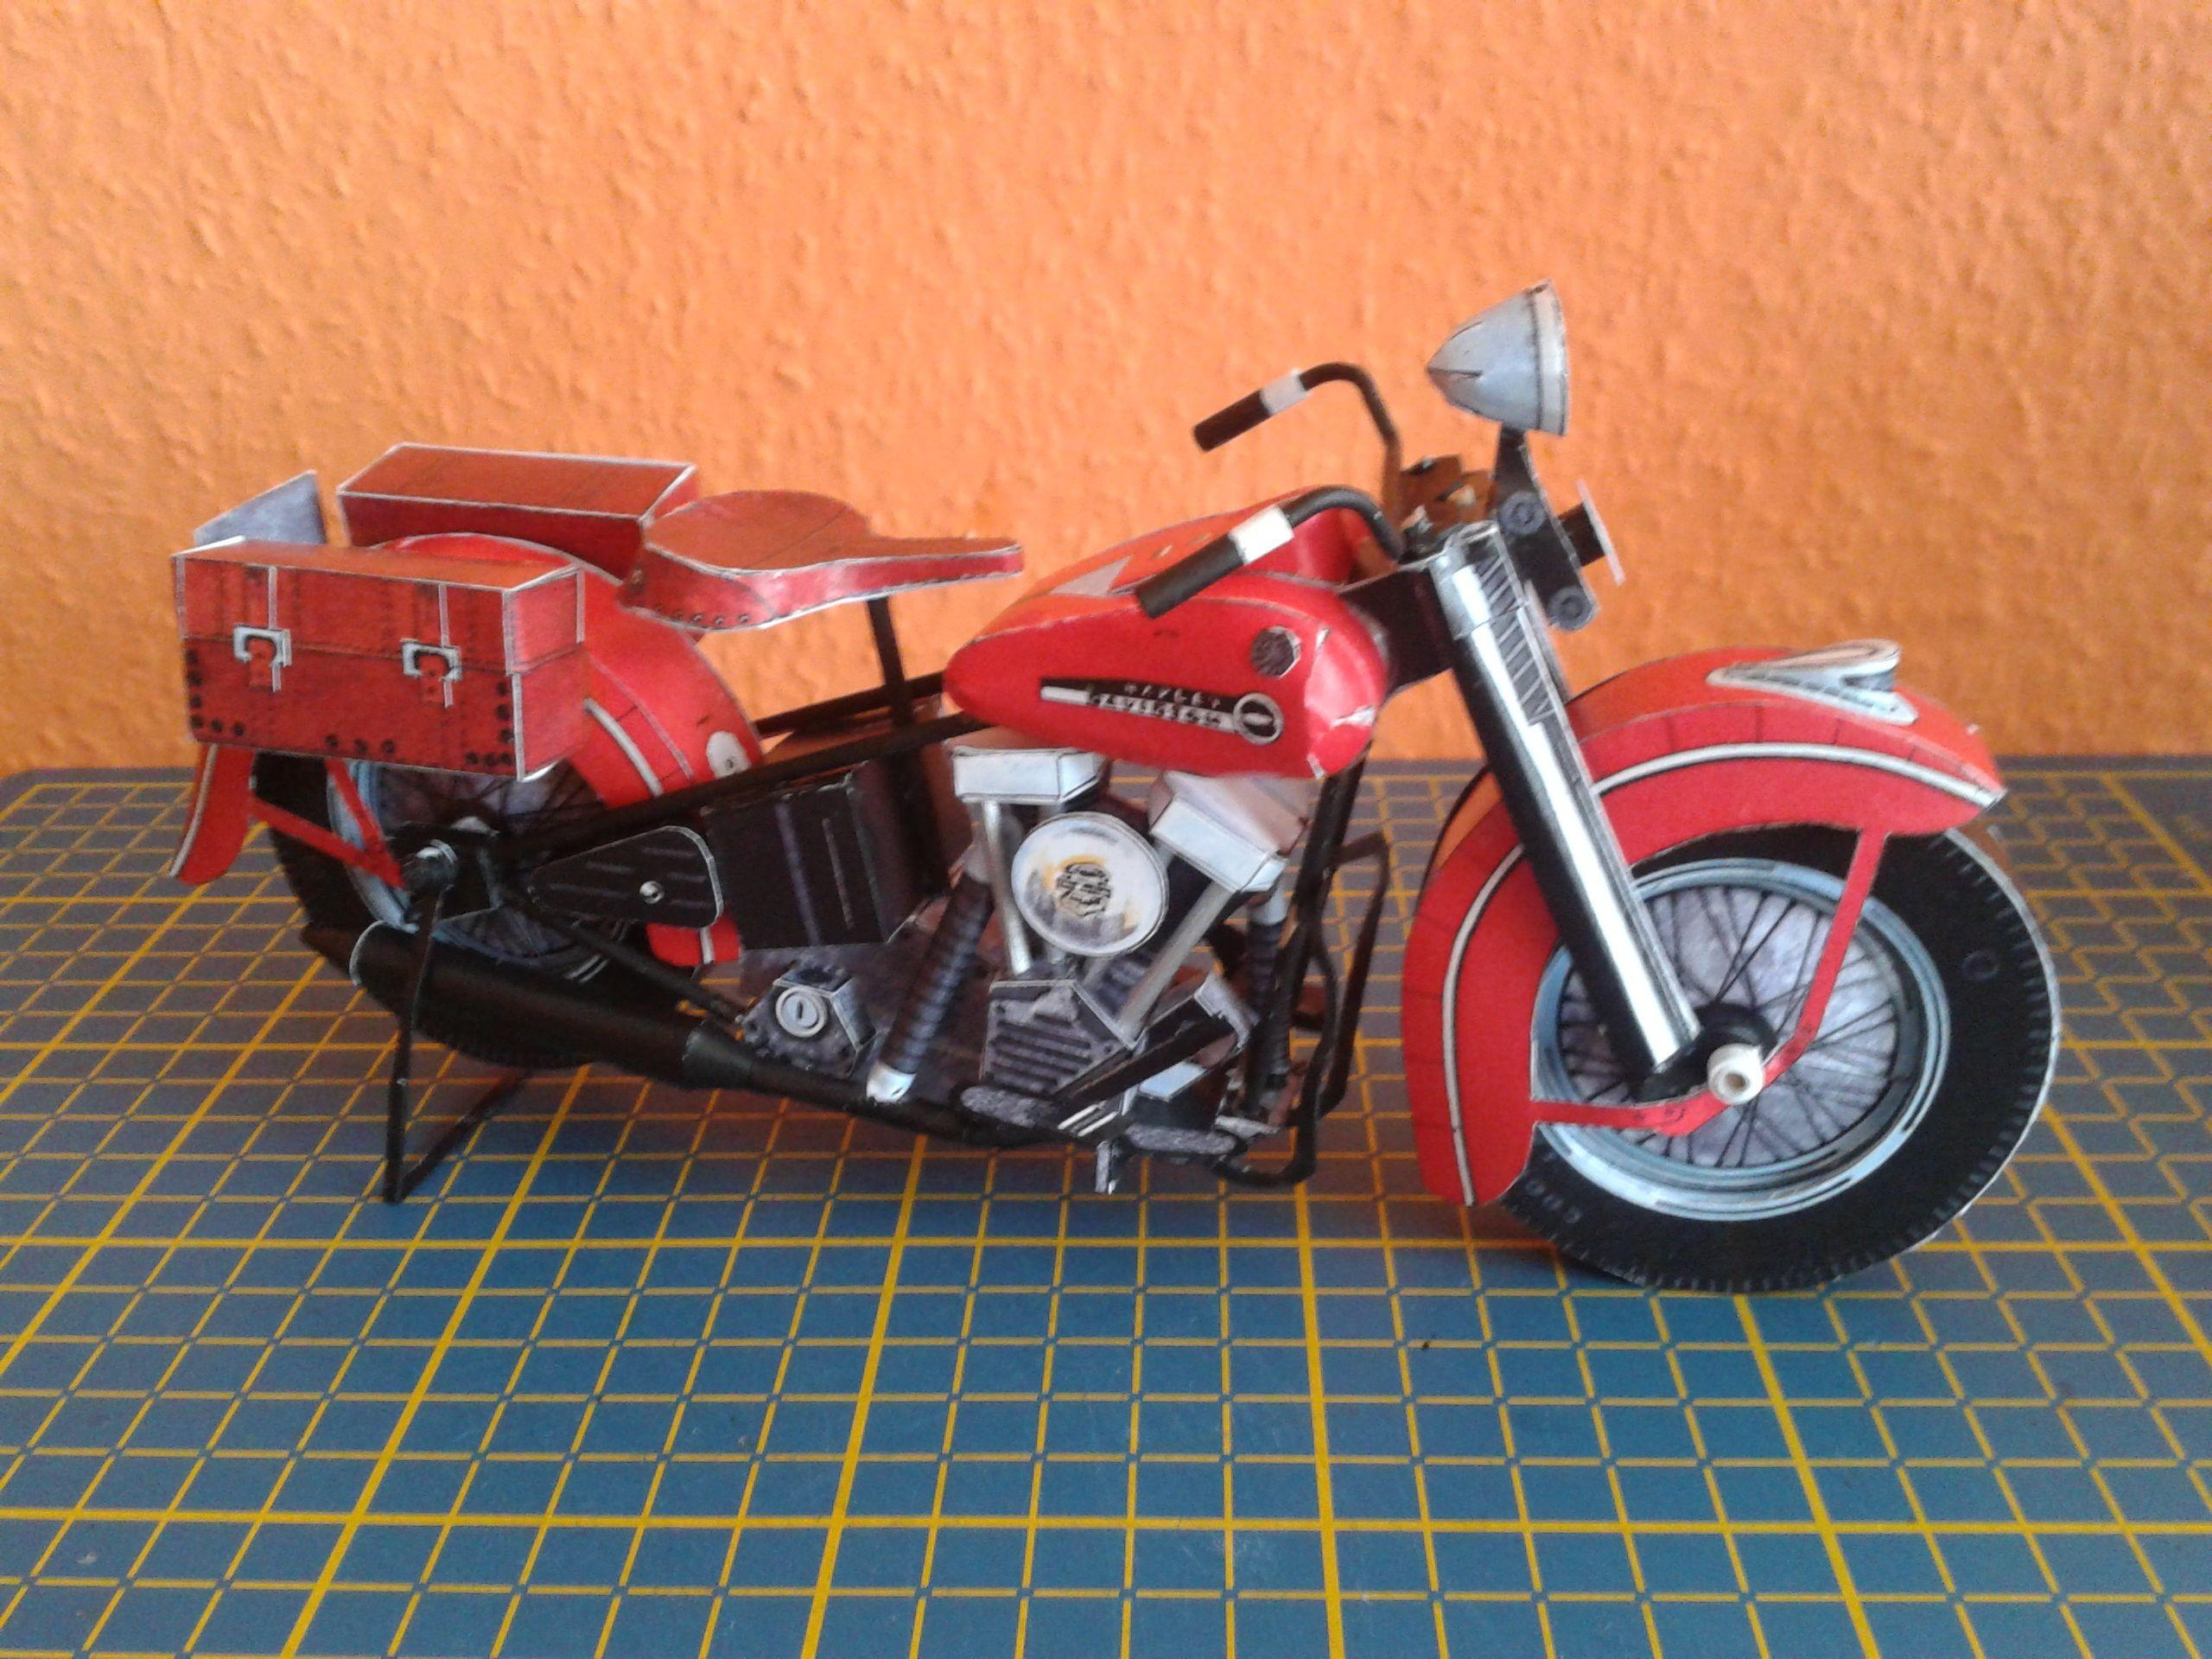 Yamaha Papercraft Motorcycle Yamaha Papercraft Yamaha Yz450f 450 °f = 232 °c Motorcycle Free